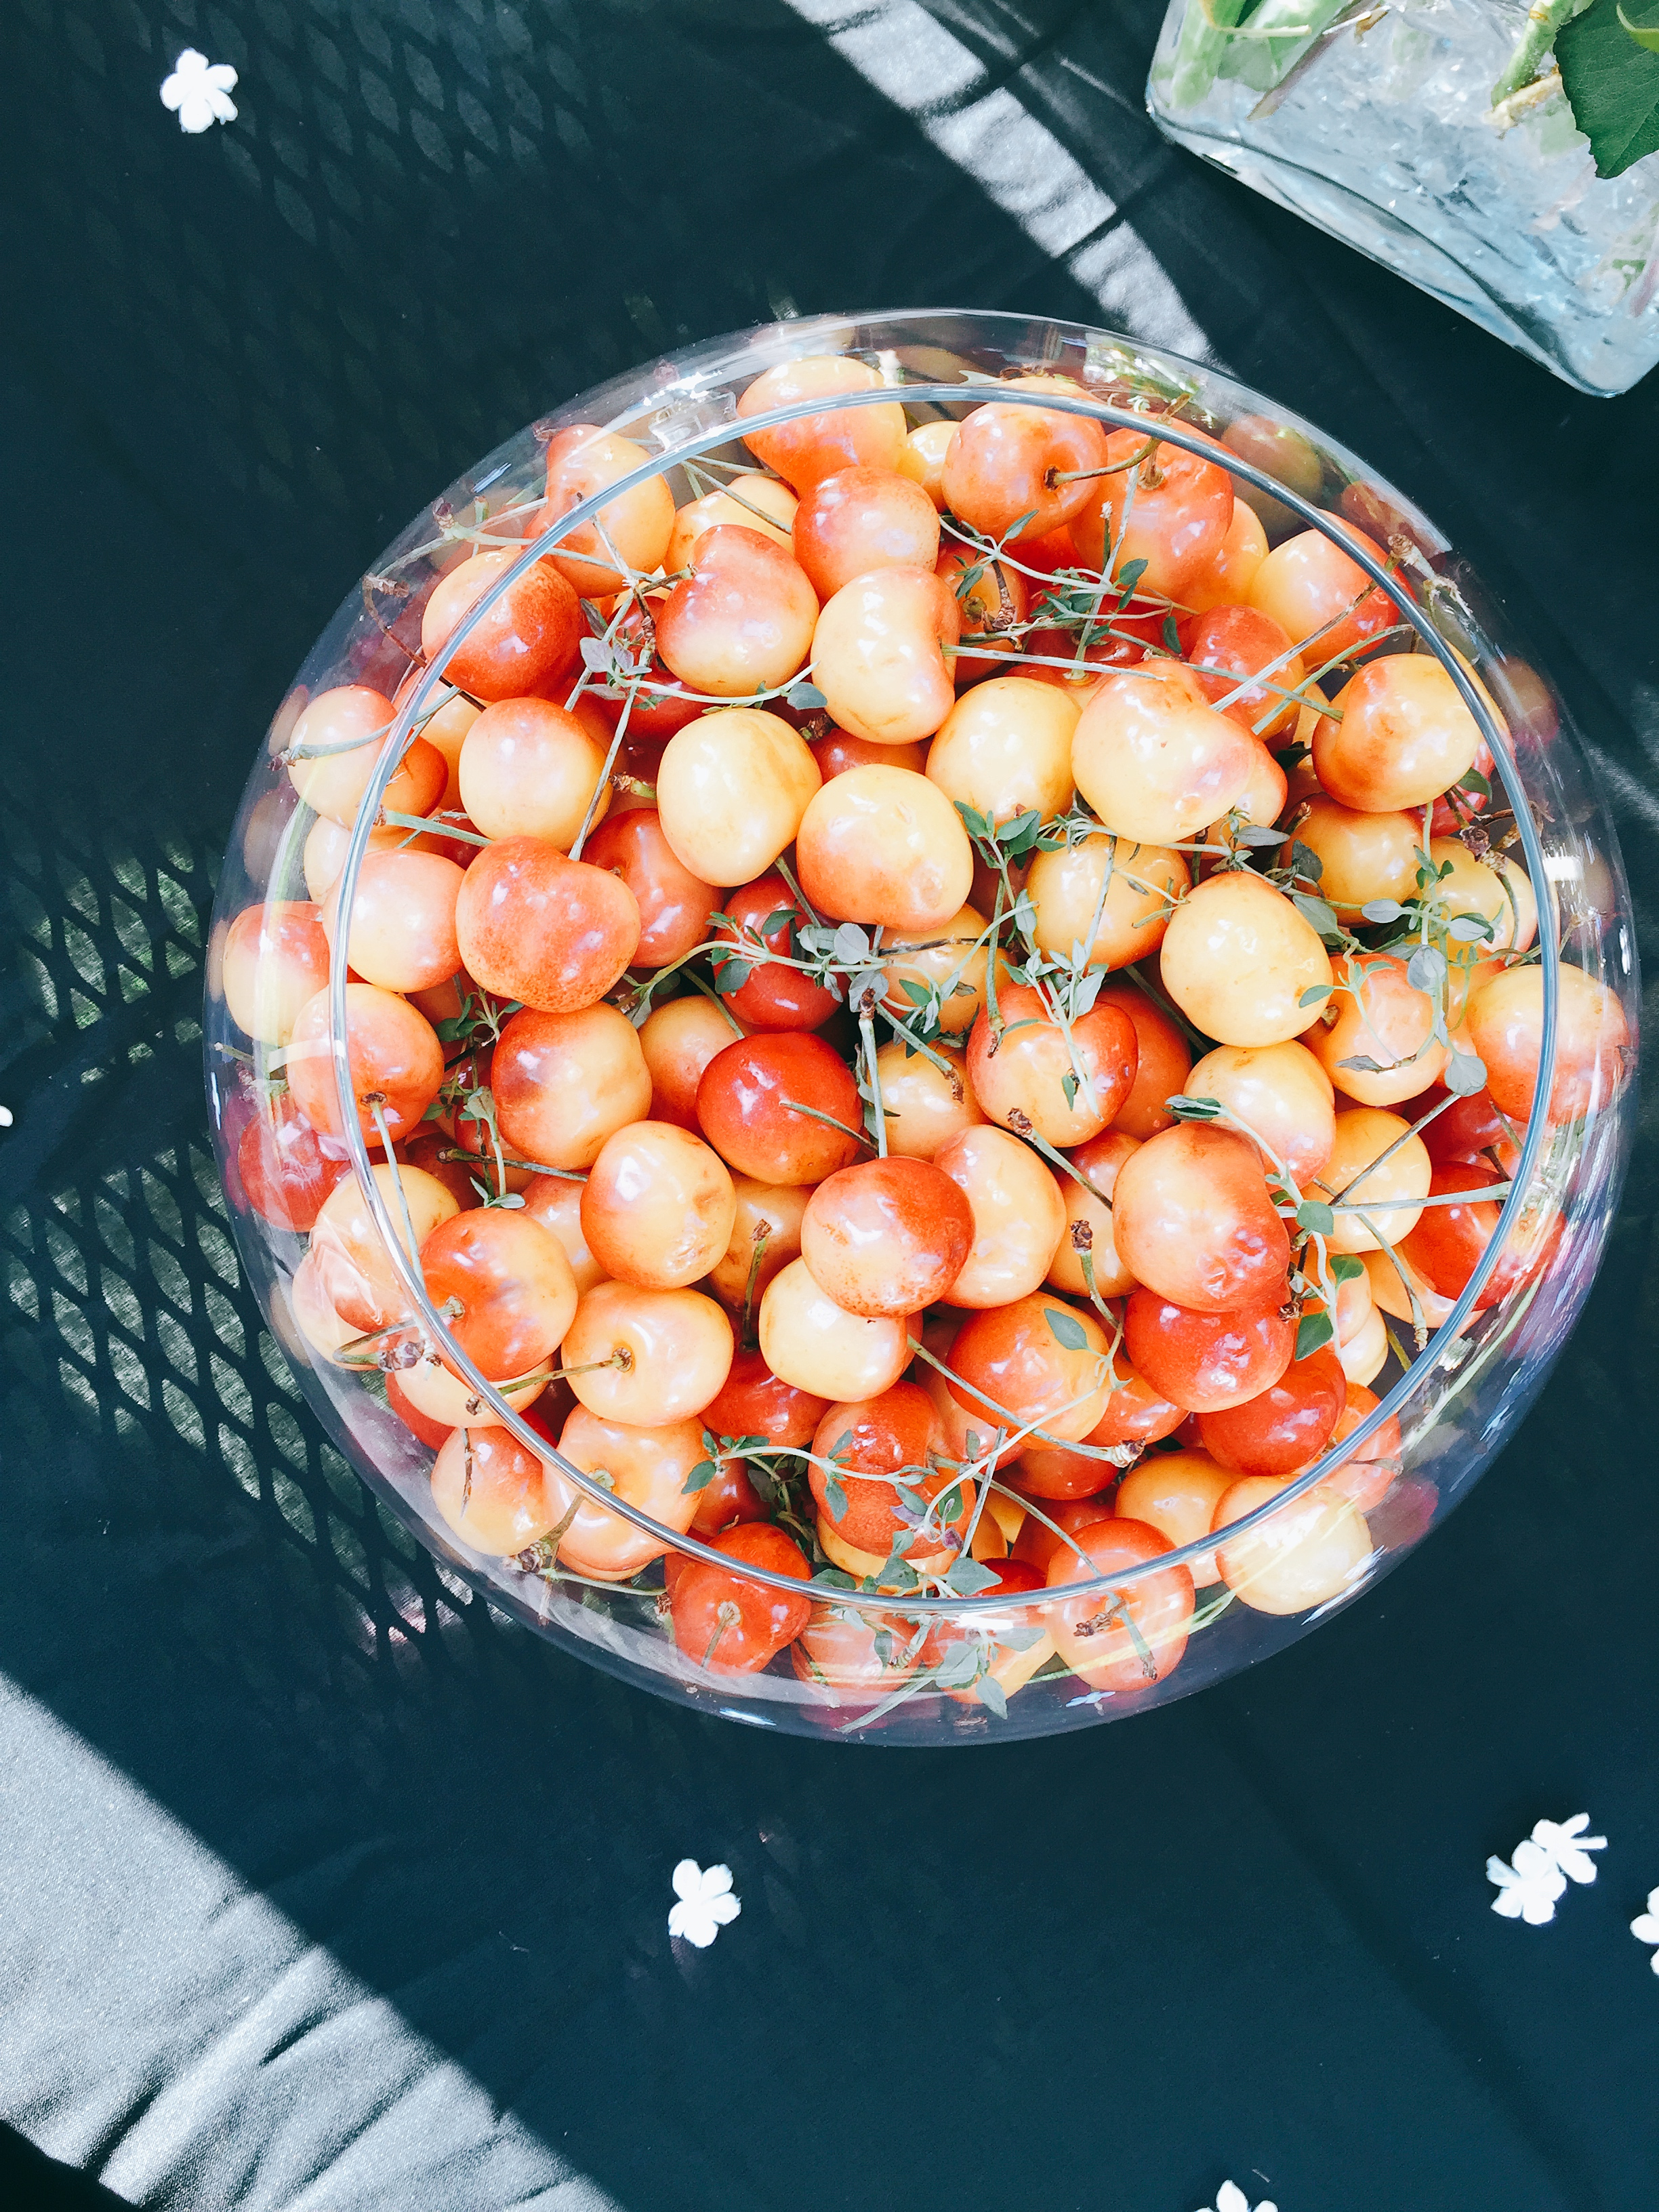 Rainier cherries especially for summer